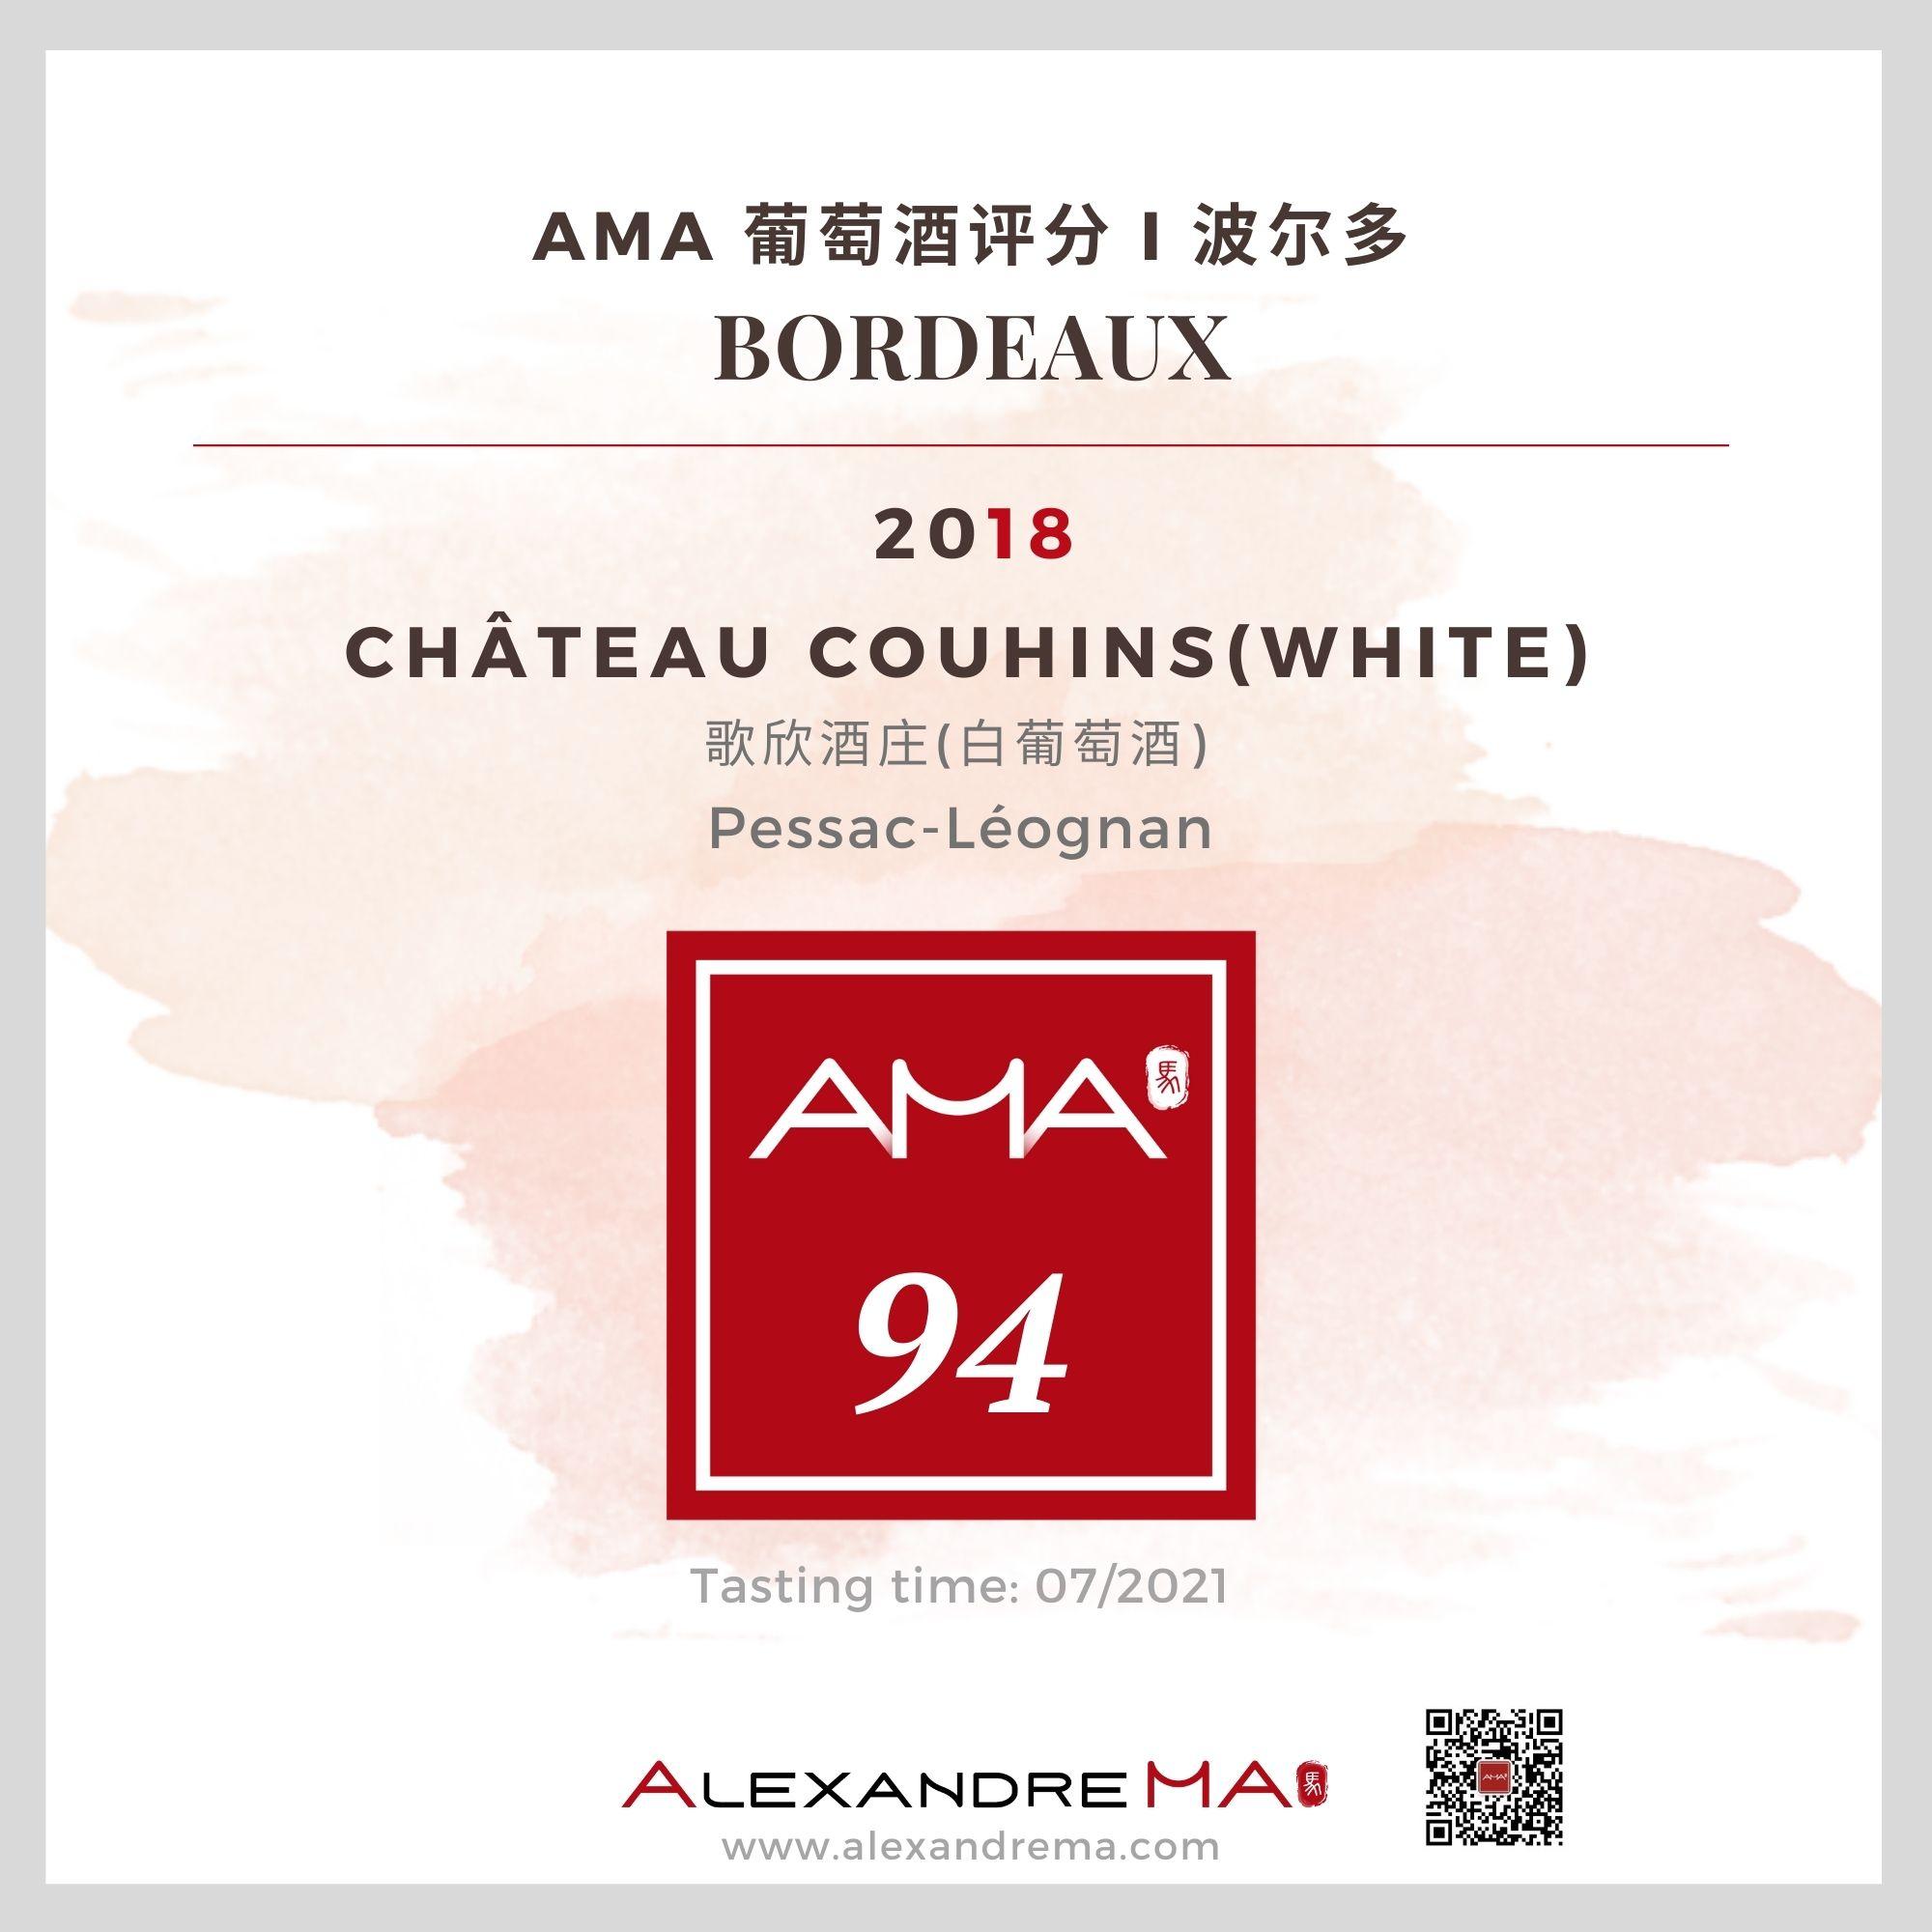 Château Couhins White 2018 歌欣酒庄 - Alexandre Ma